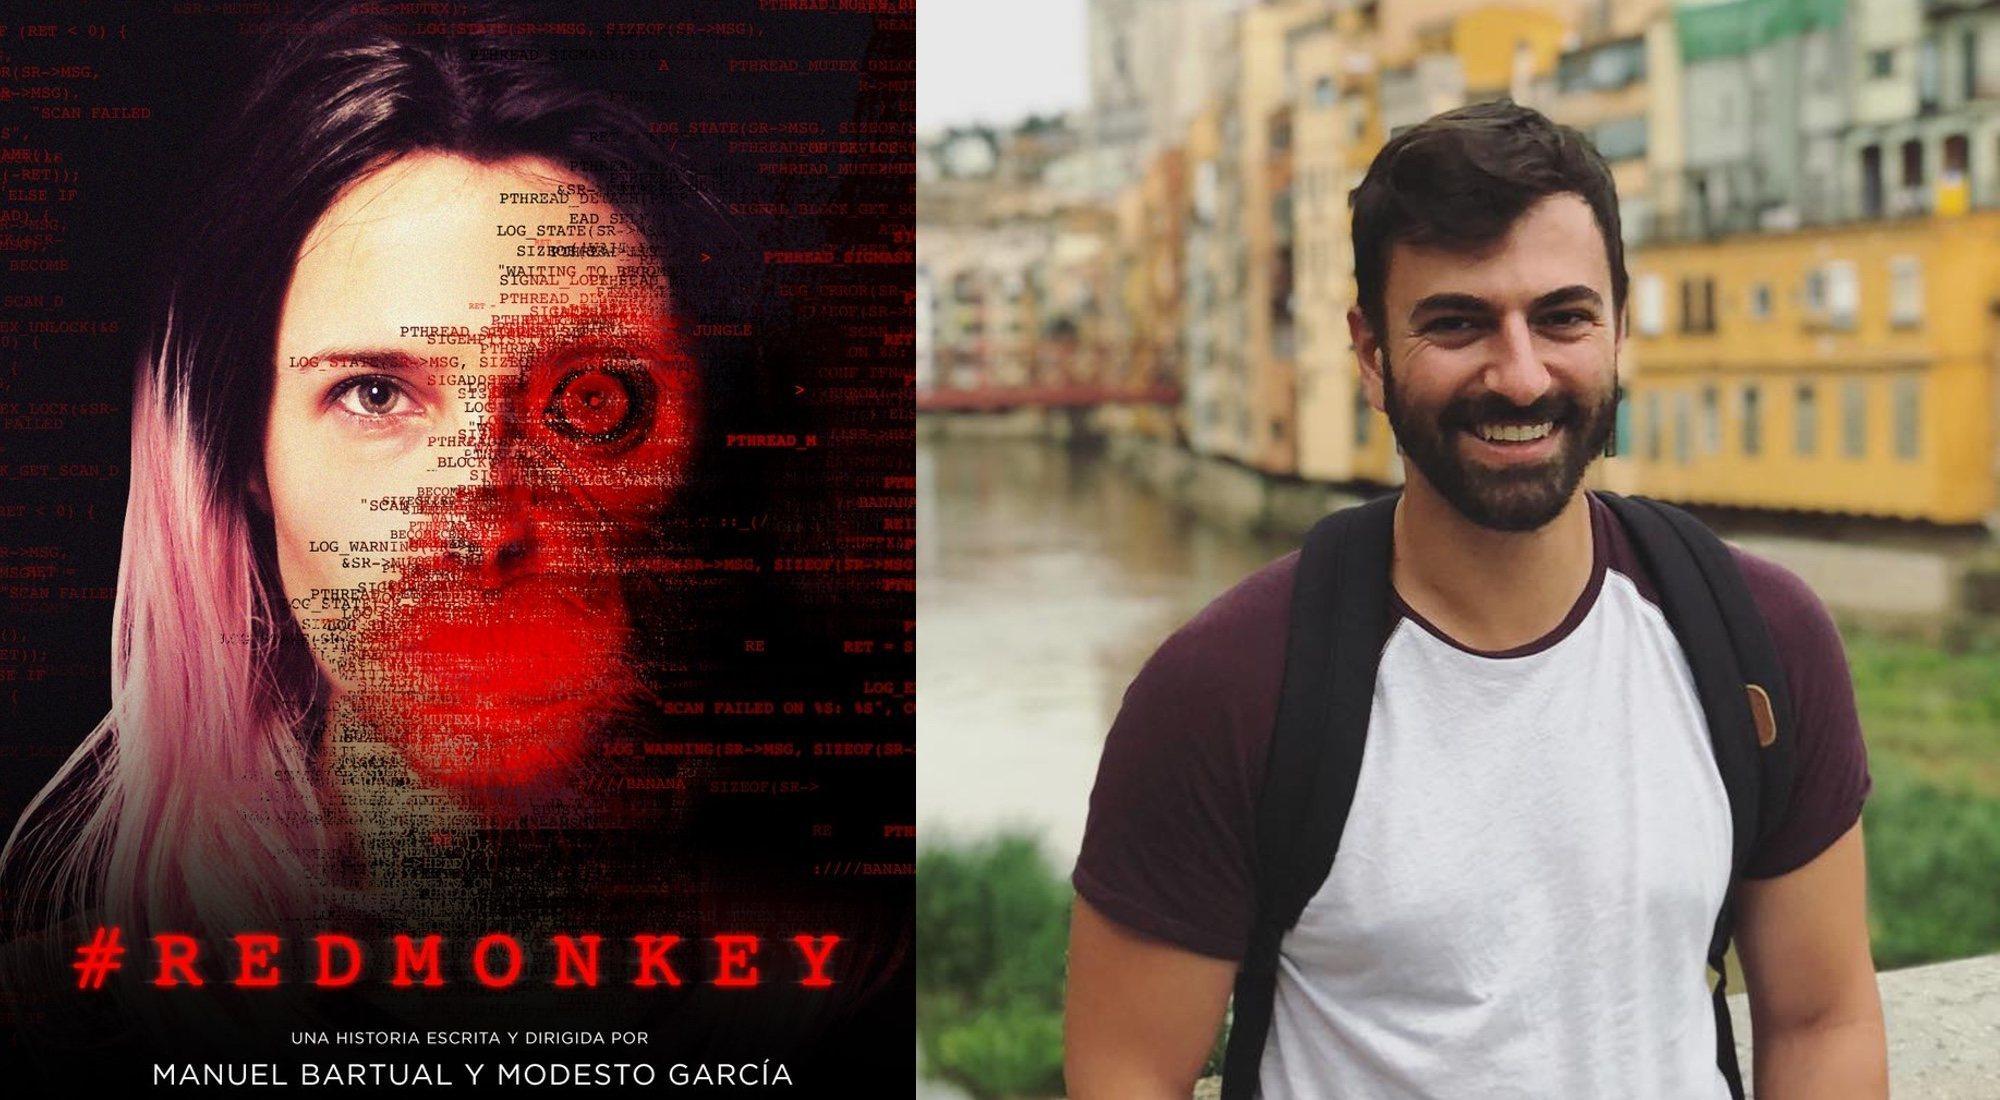 Entrevista a Modesto García, creador del hilo de Red Monkey